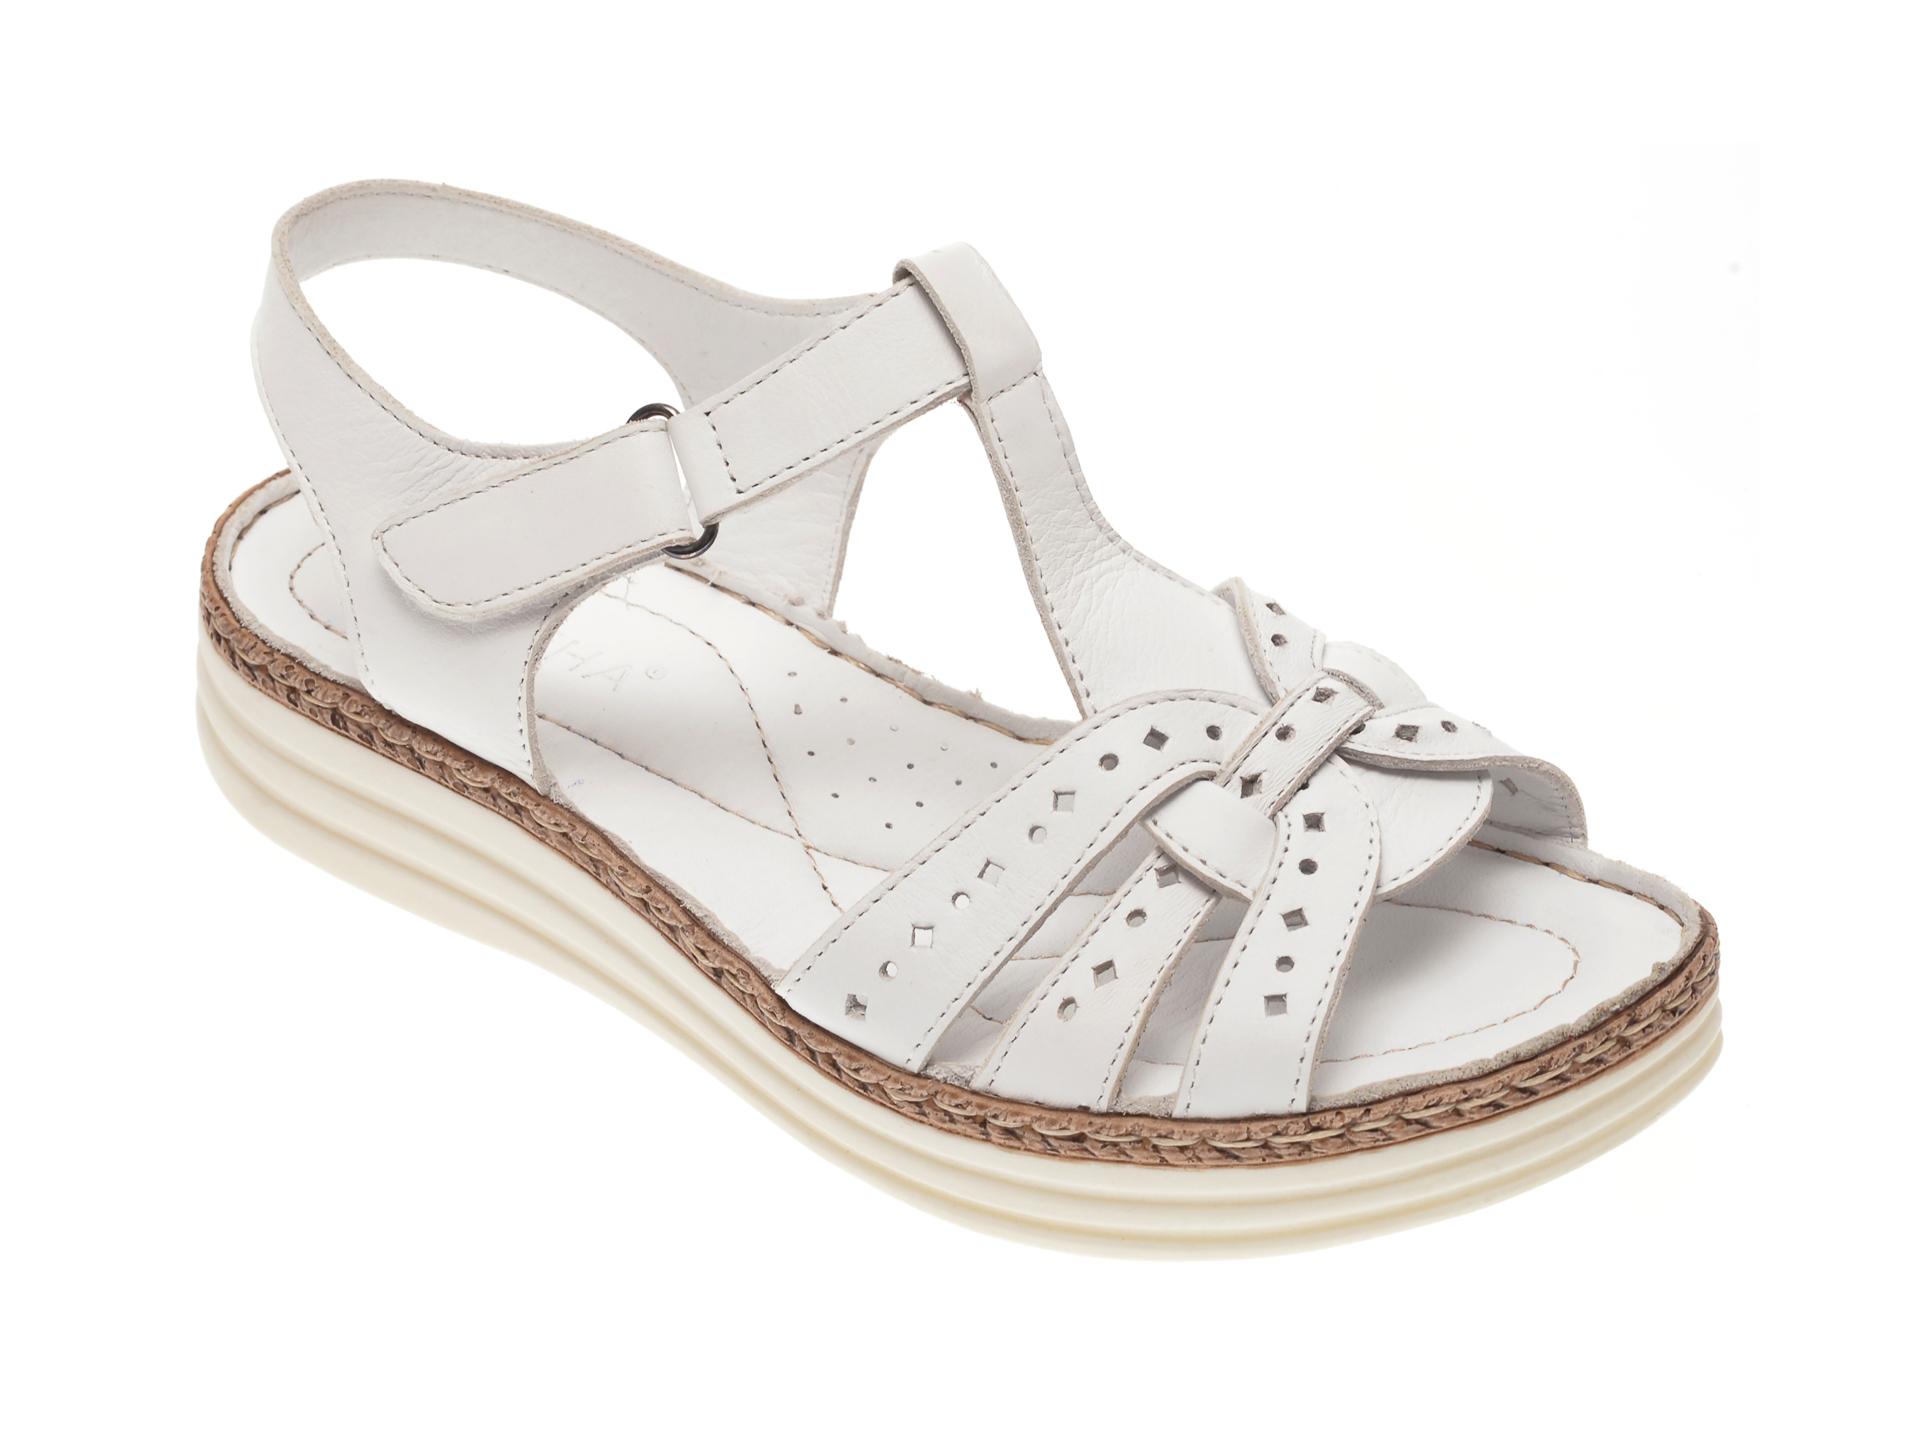 Sandale MARCHA albe, 517, din piele naturala